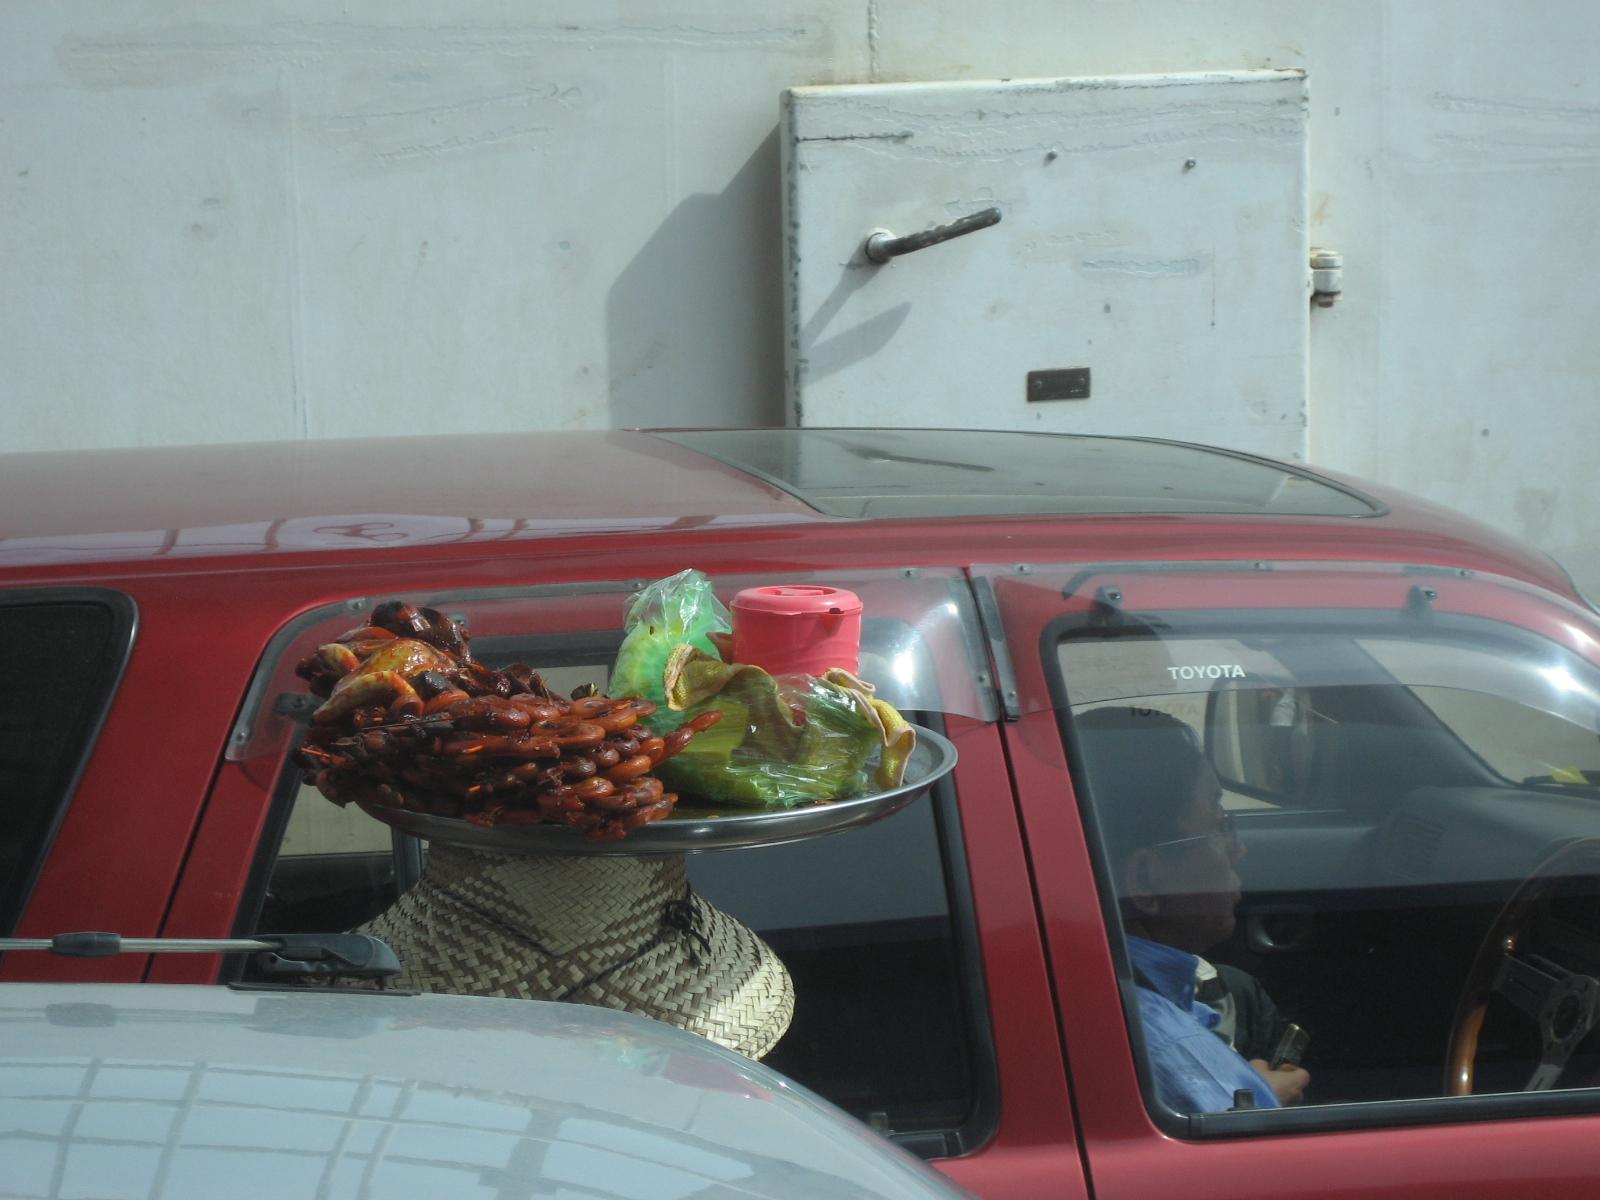 Roadside snacks